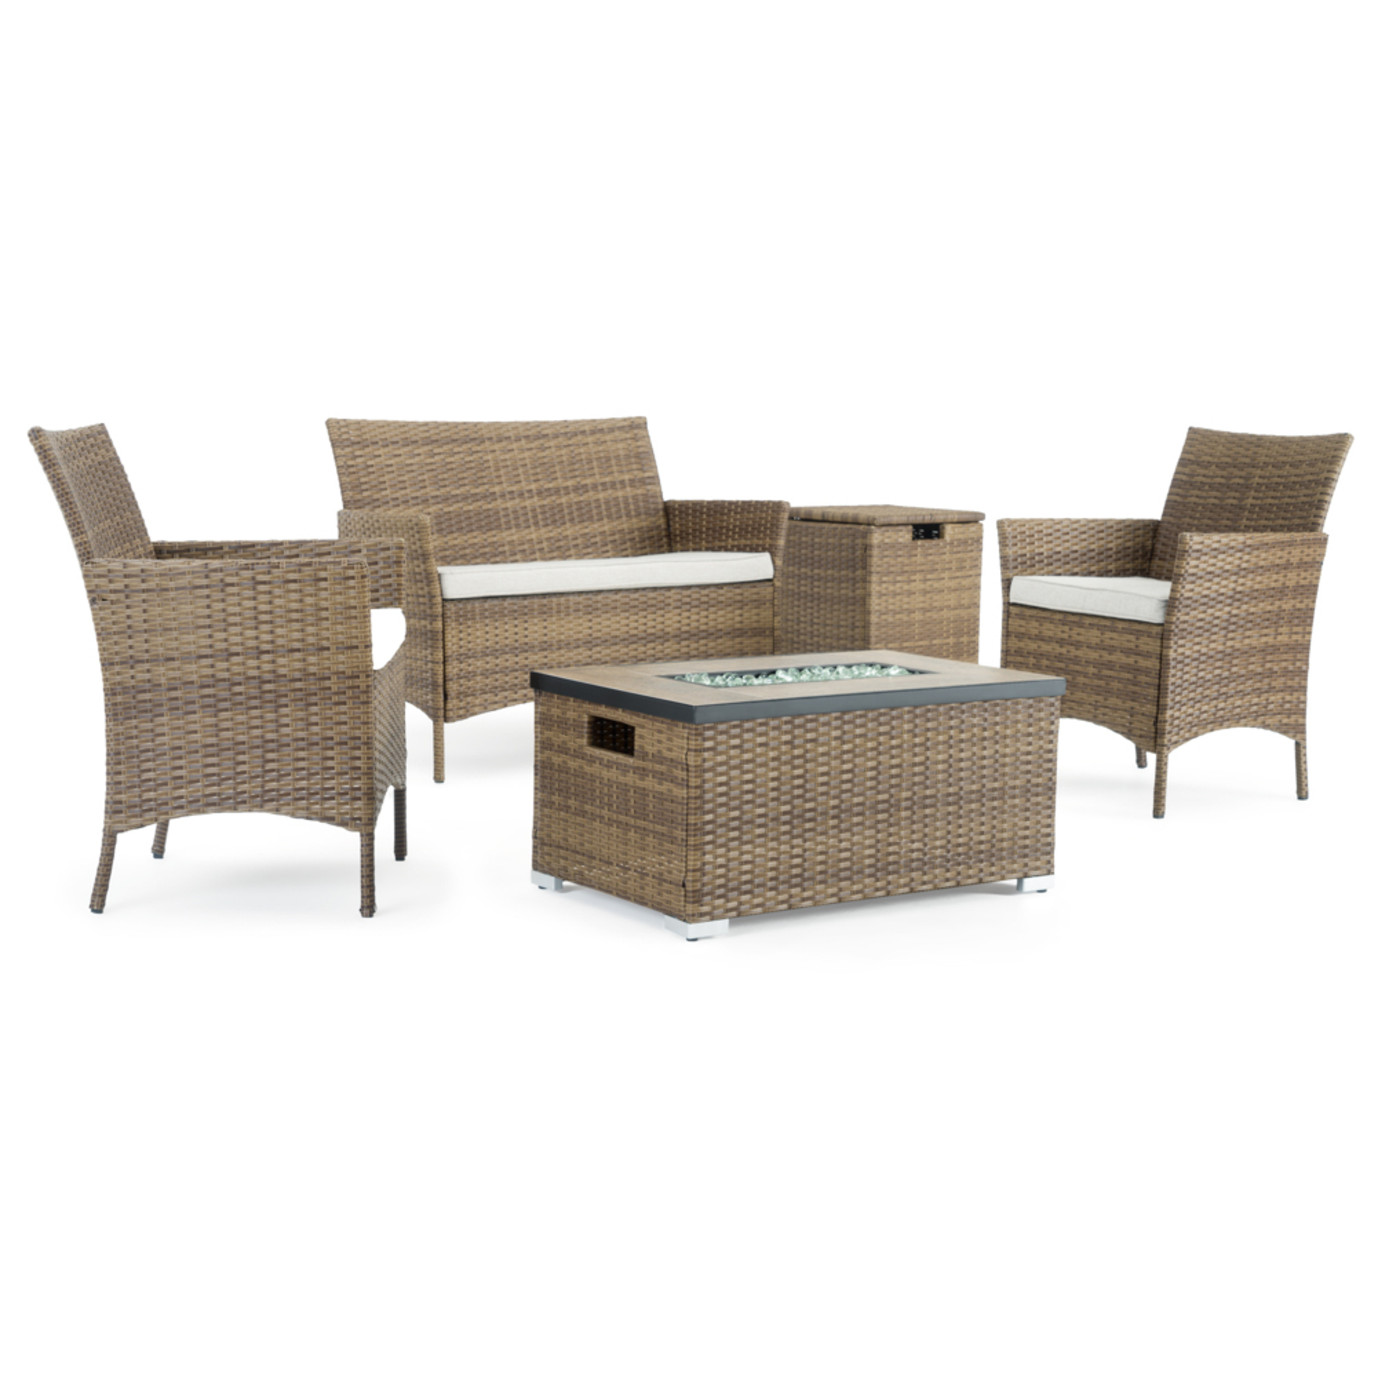 Kanab 4 Piece Fire Seating Set - Brown